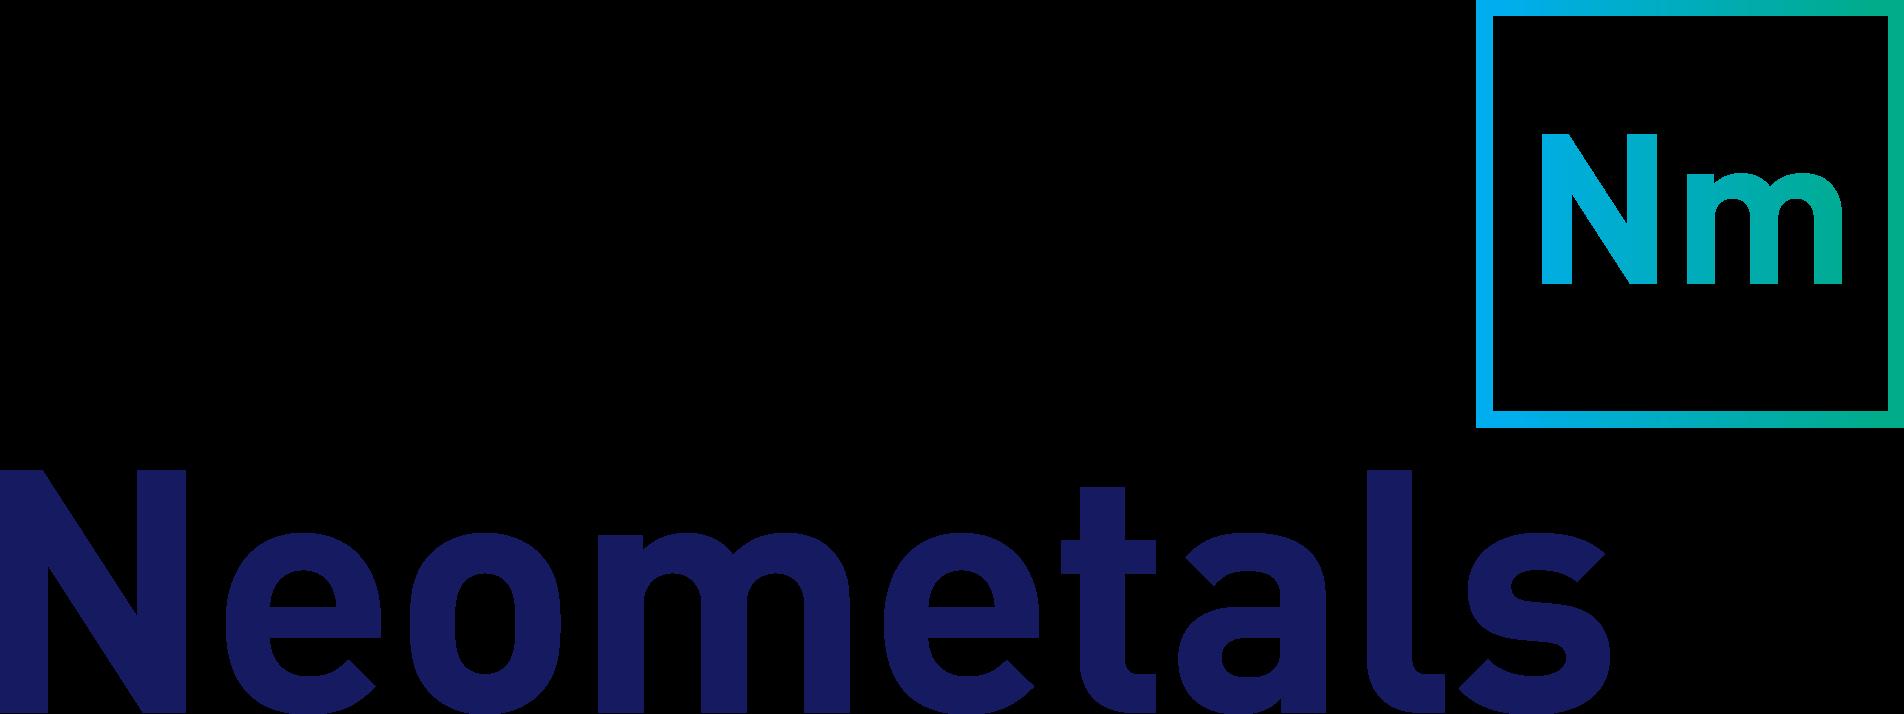 Neometals Ltd (NMT:ASX) logo